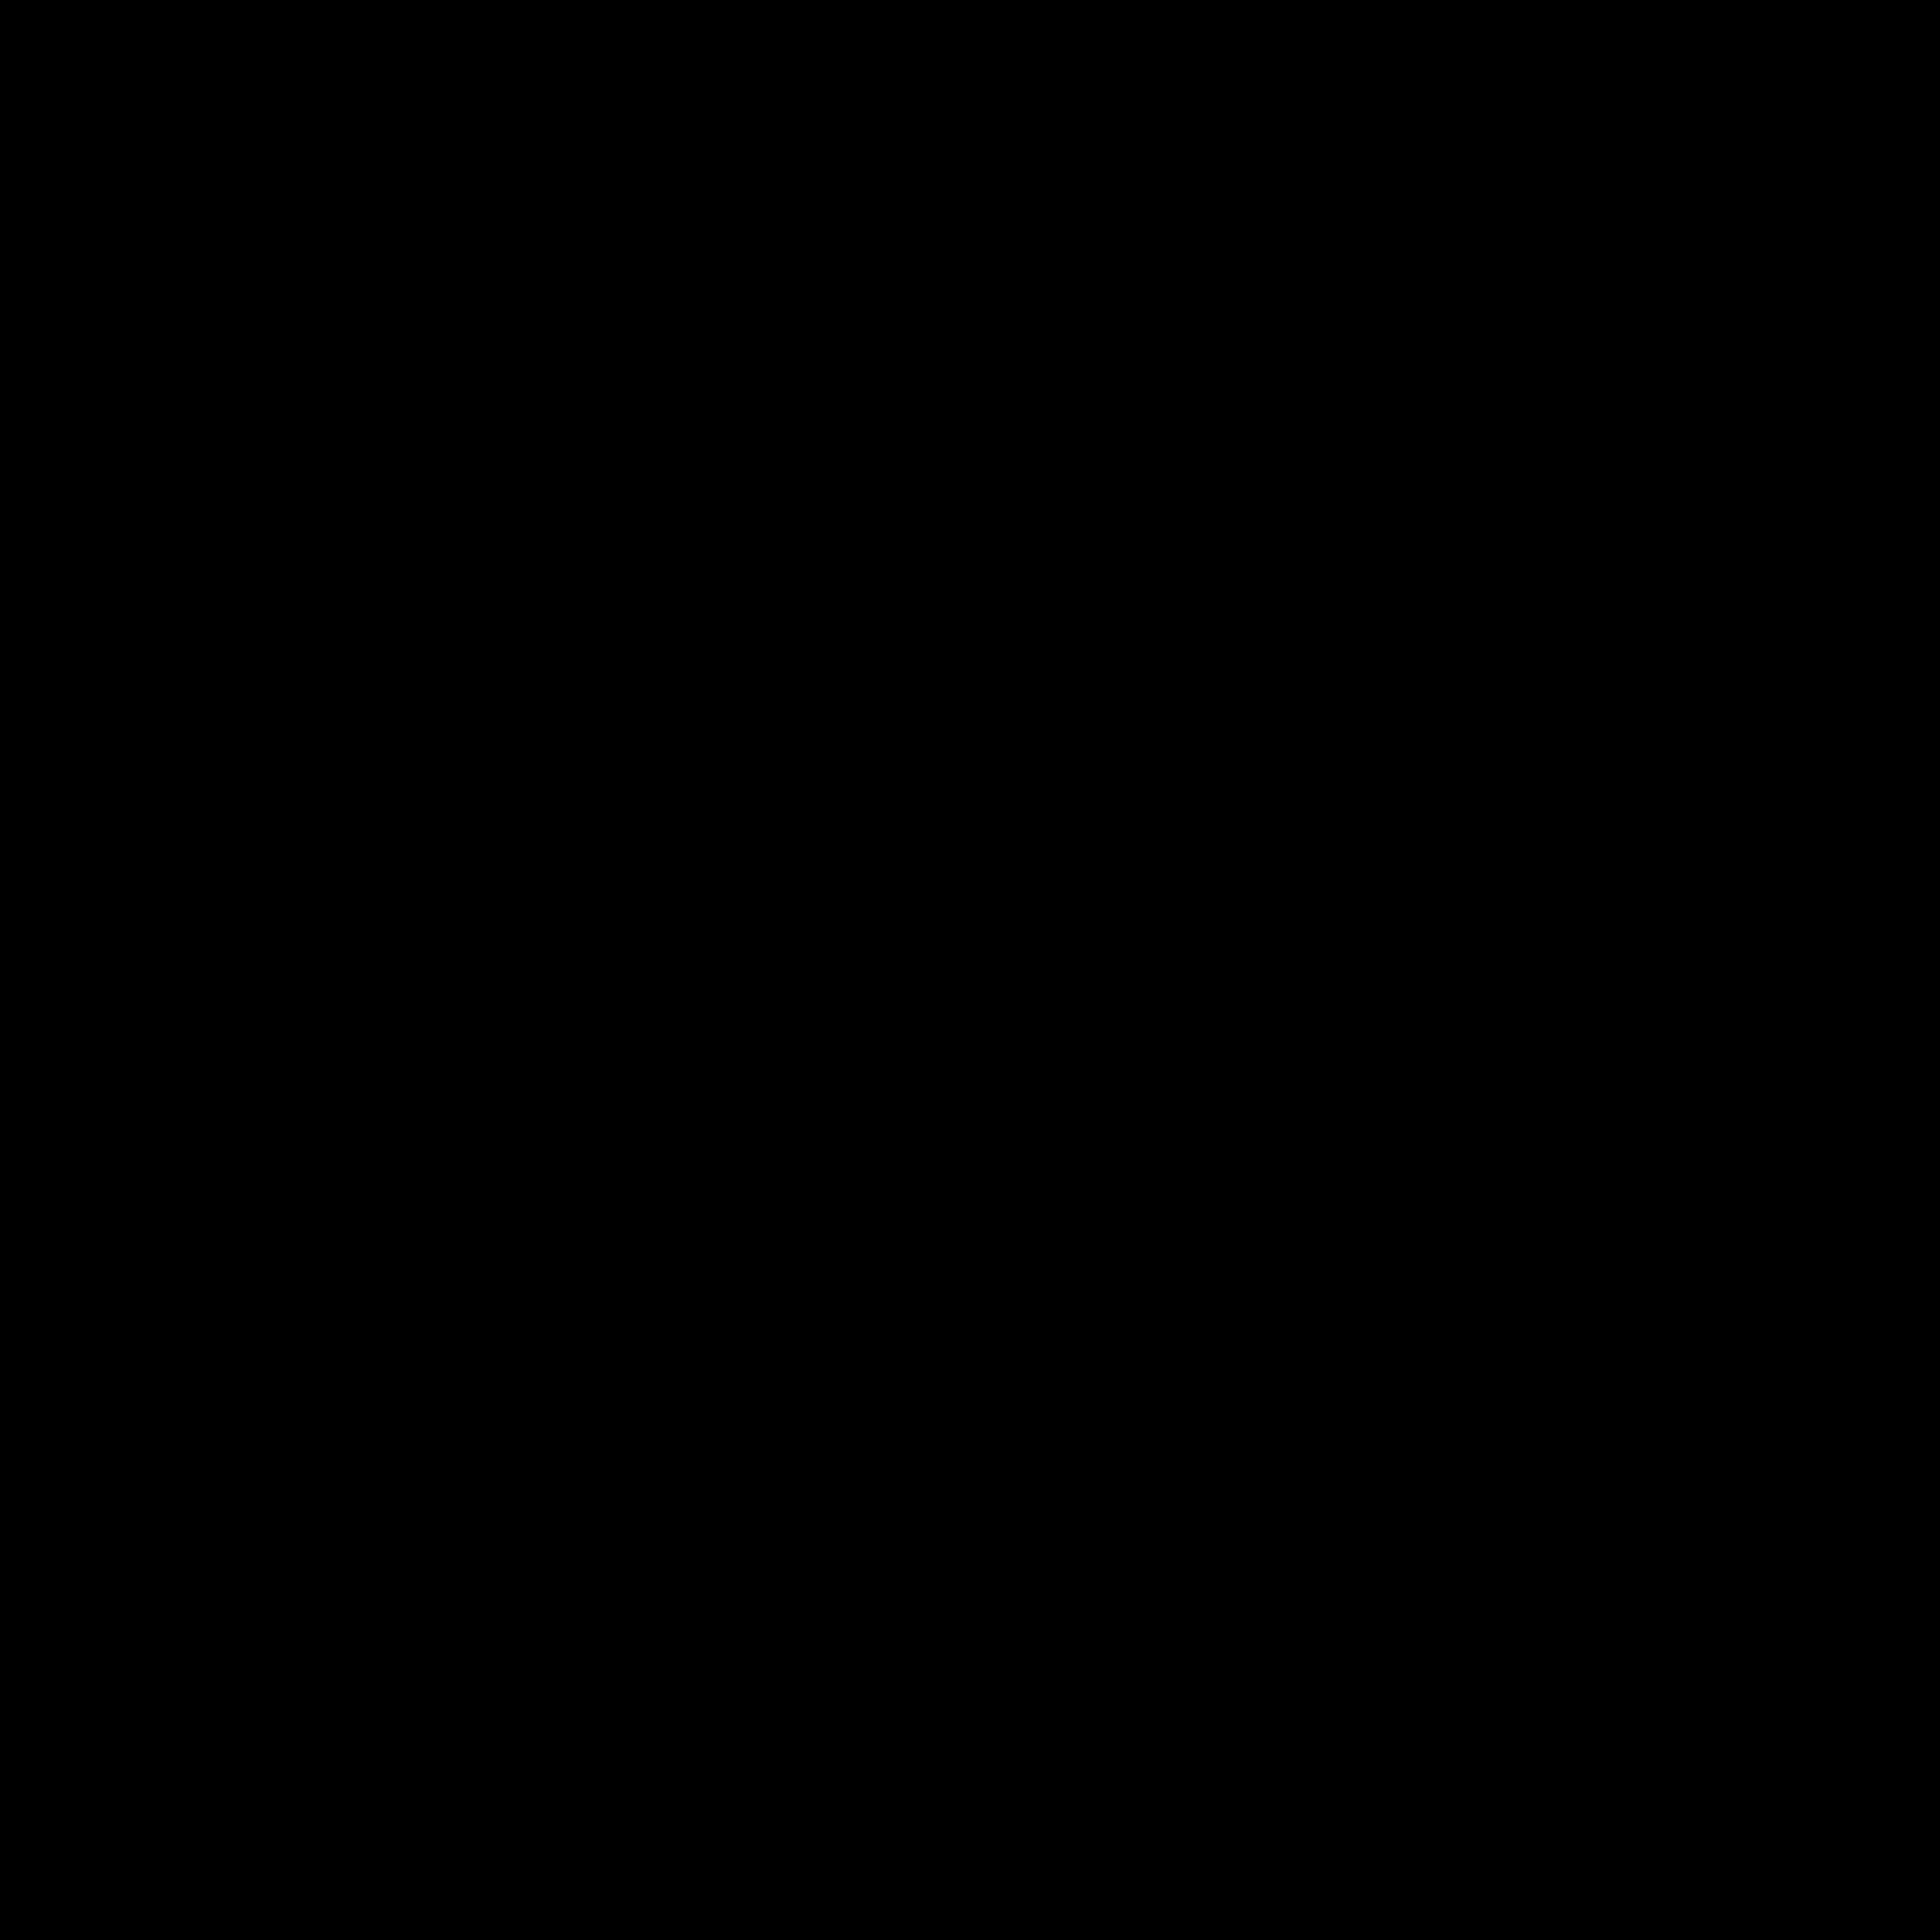 4096x4096 Instagram Logo Printable Banner Freeuse Library